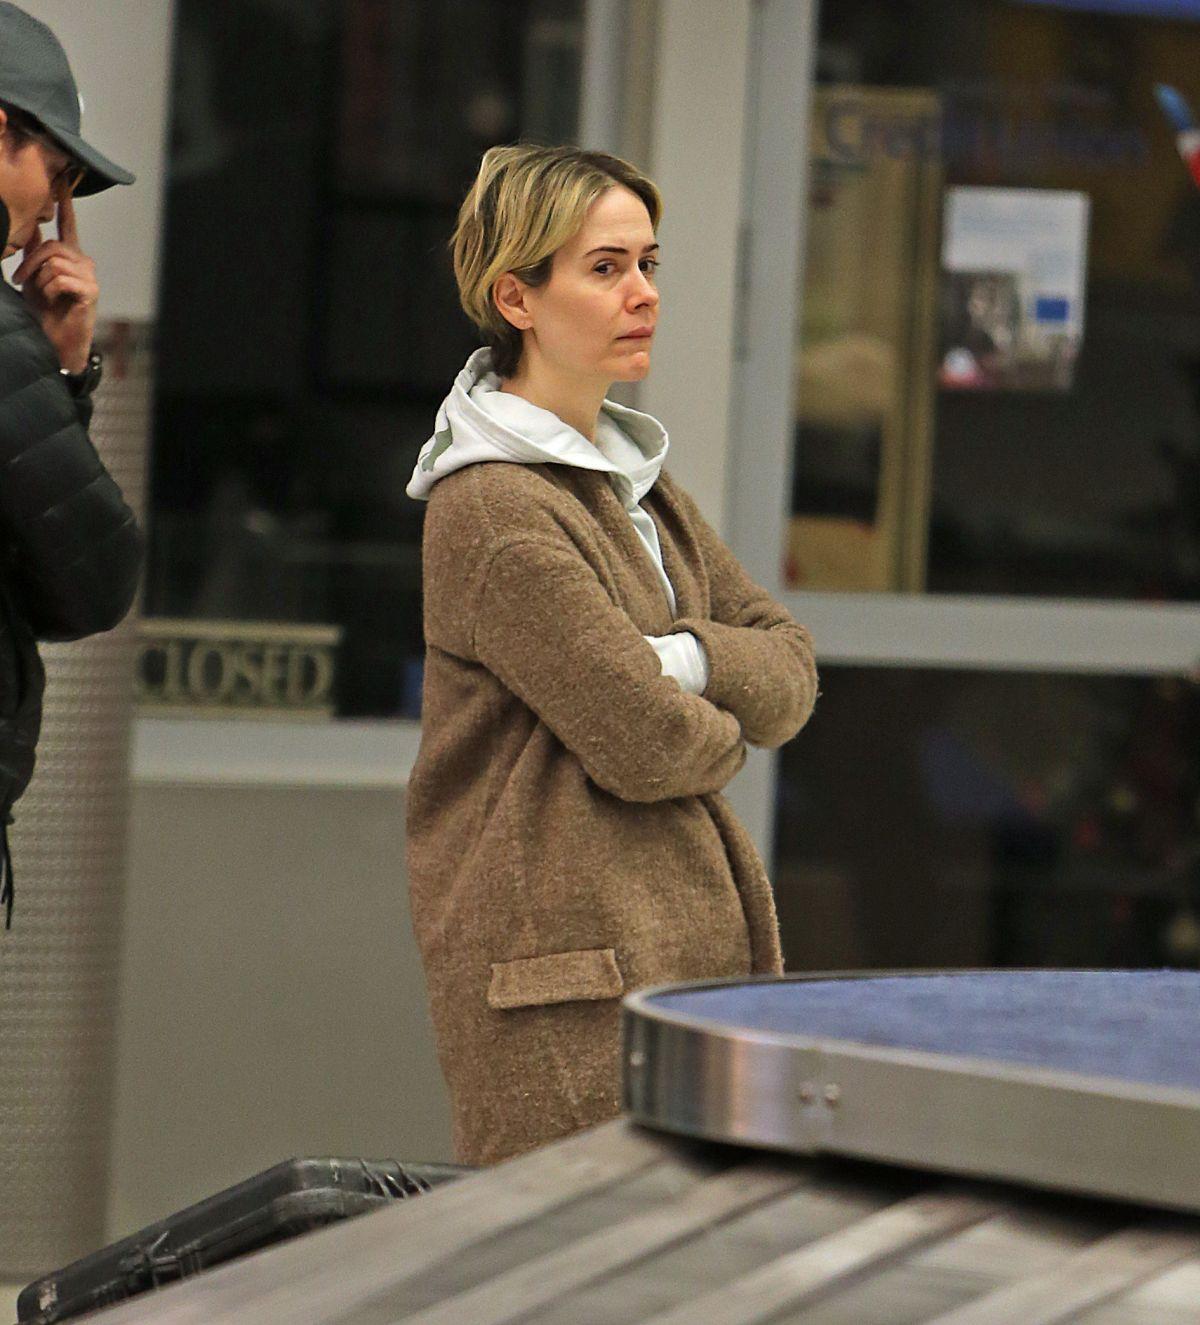 SARAH PAULSON at JFK Airport in New York 01/09/2017 ...